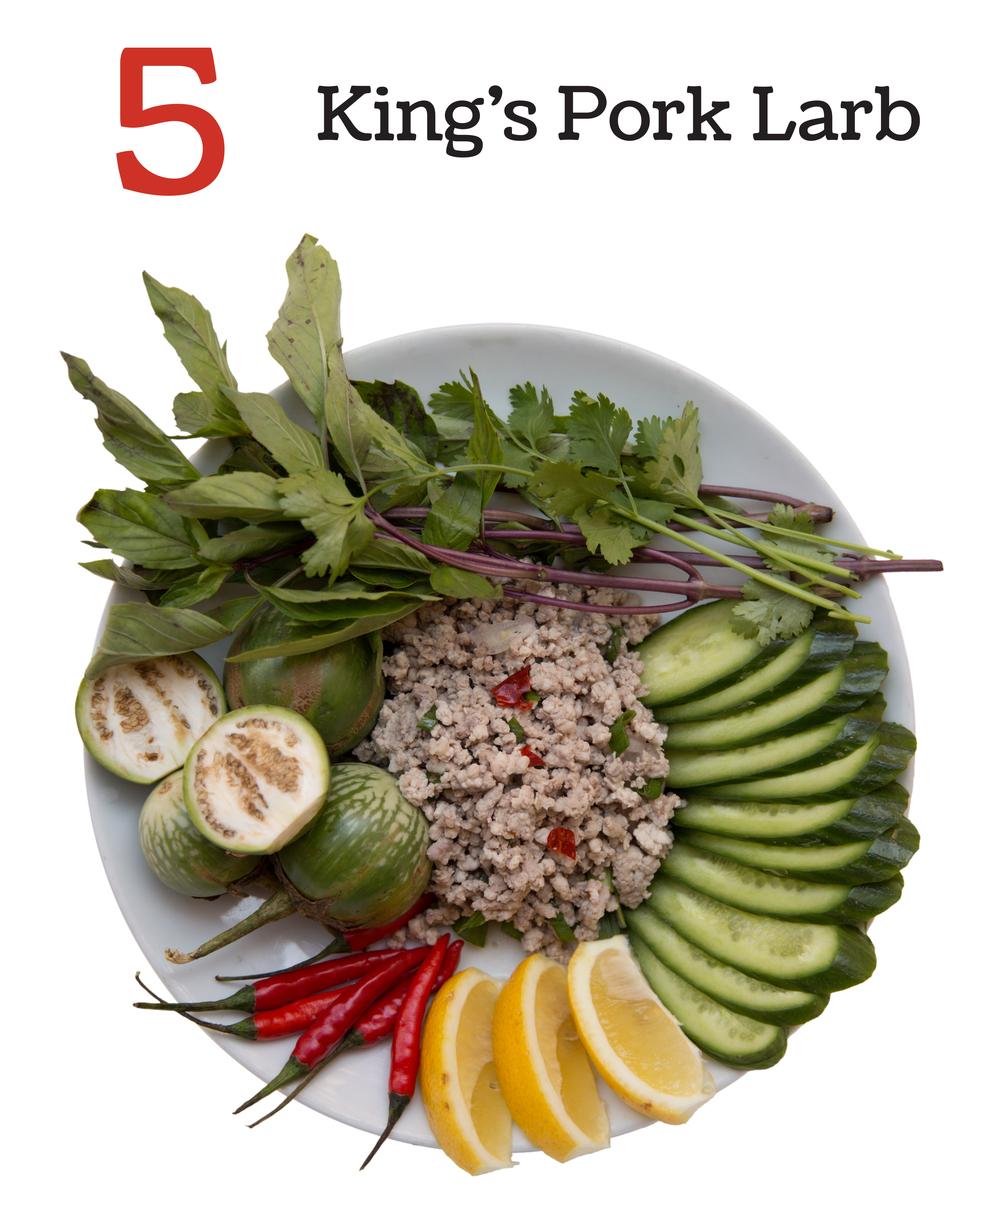 5 King's Pork Larb.jpg